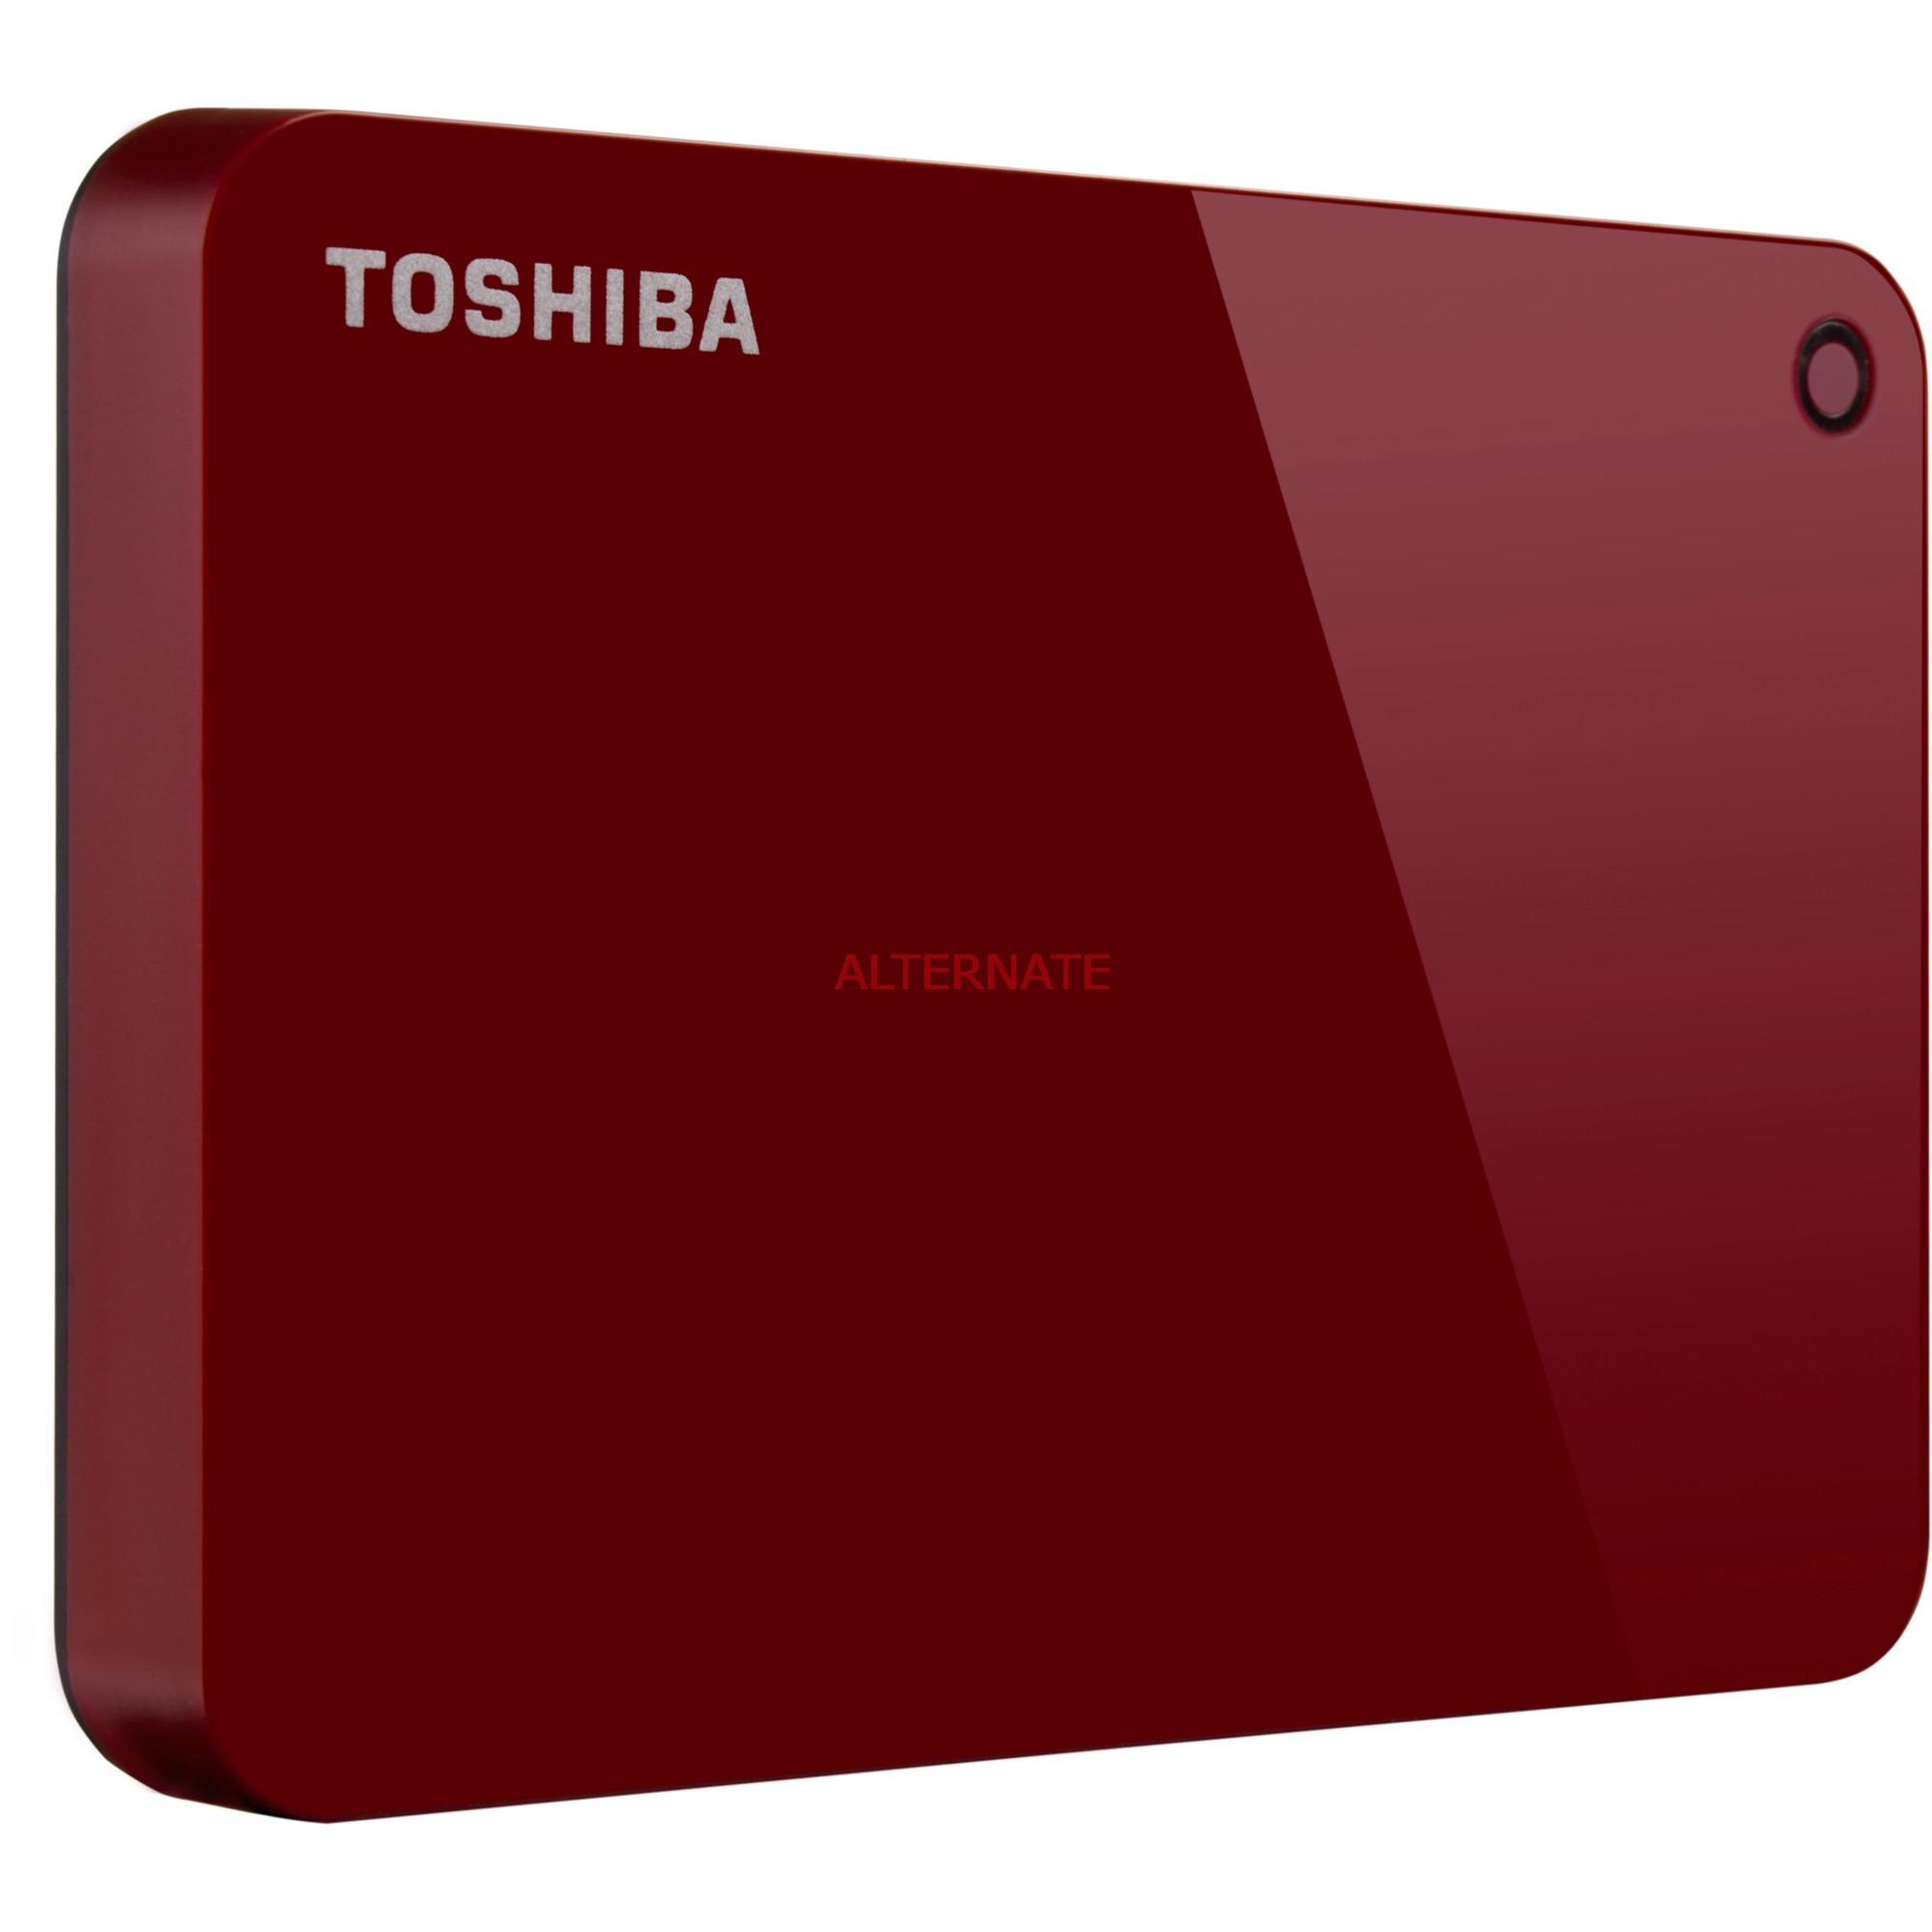 Canvio Advance disco duro externo 2000 GB Rojo, Unidad de disco duro